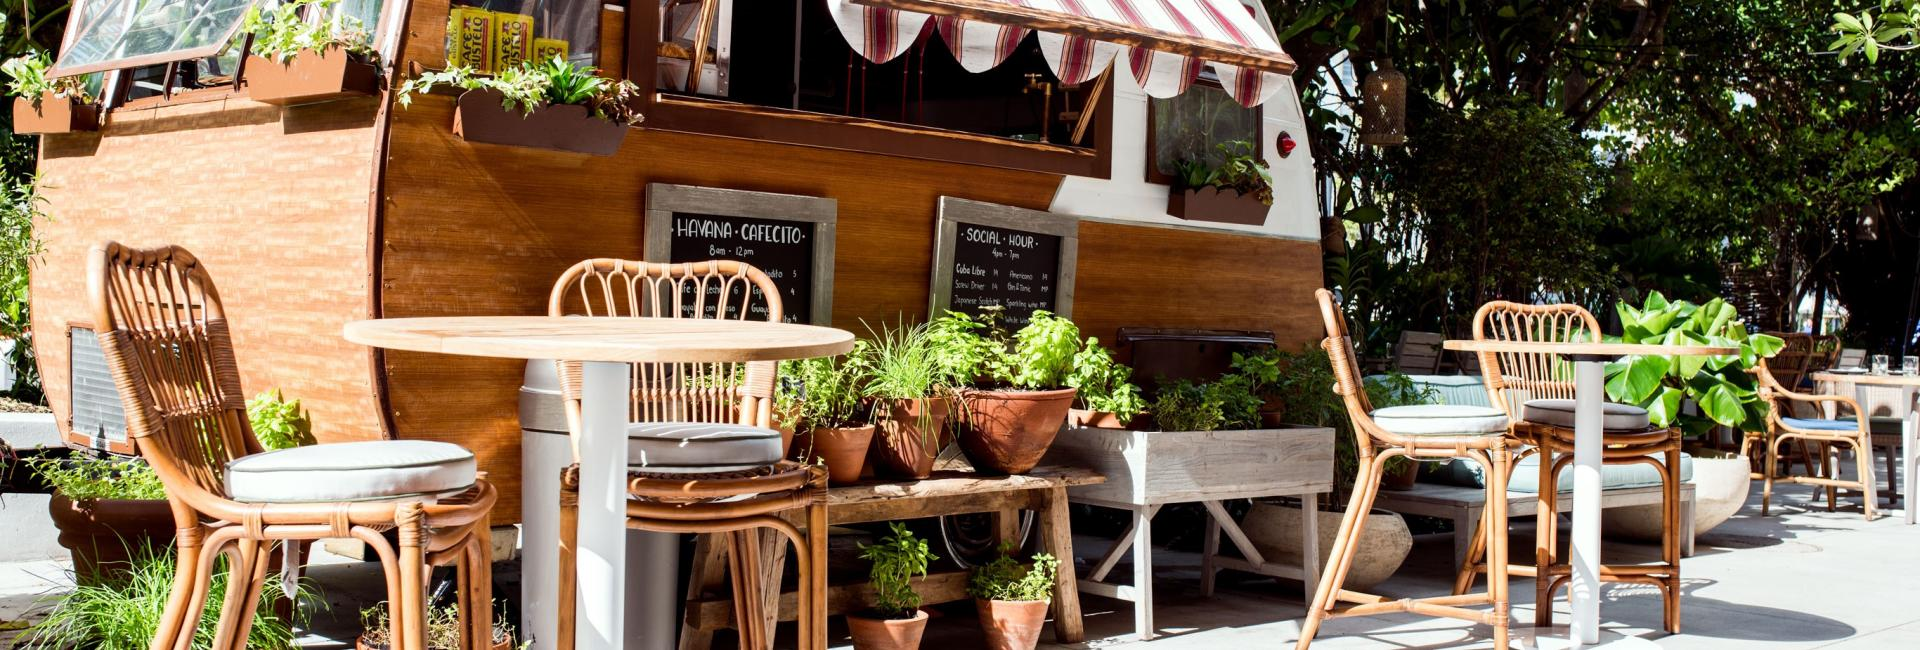 Habitat food truck on a sunny day